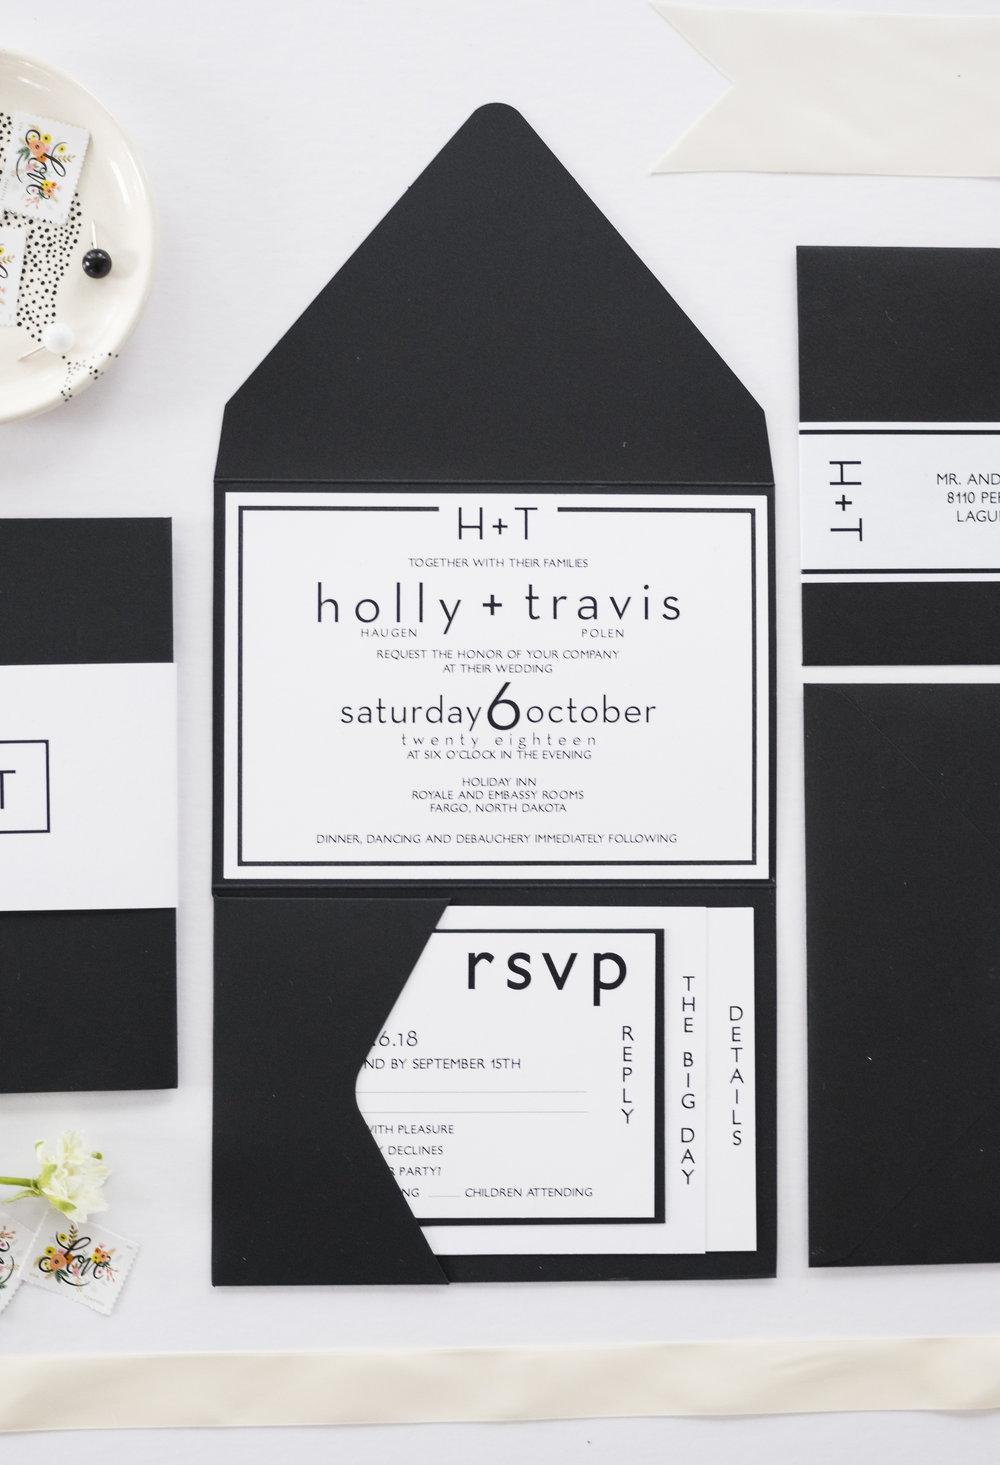 Holly_Suite_huntwrightdesignco_28_2.jpg